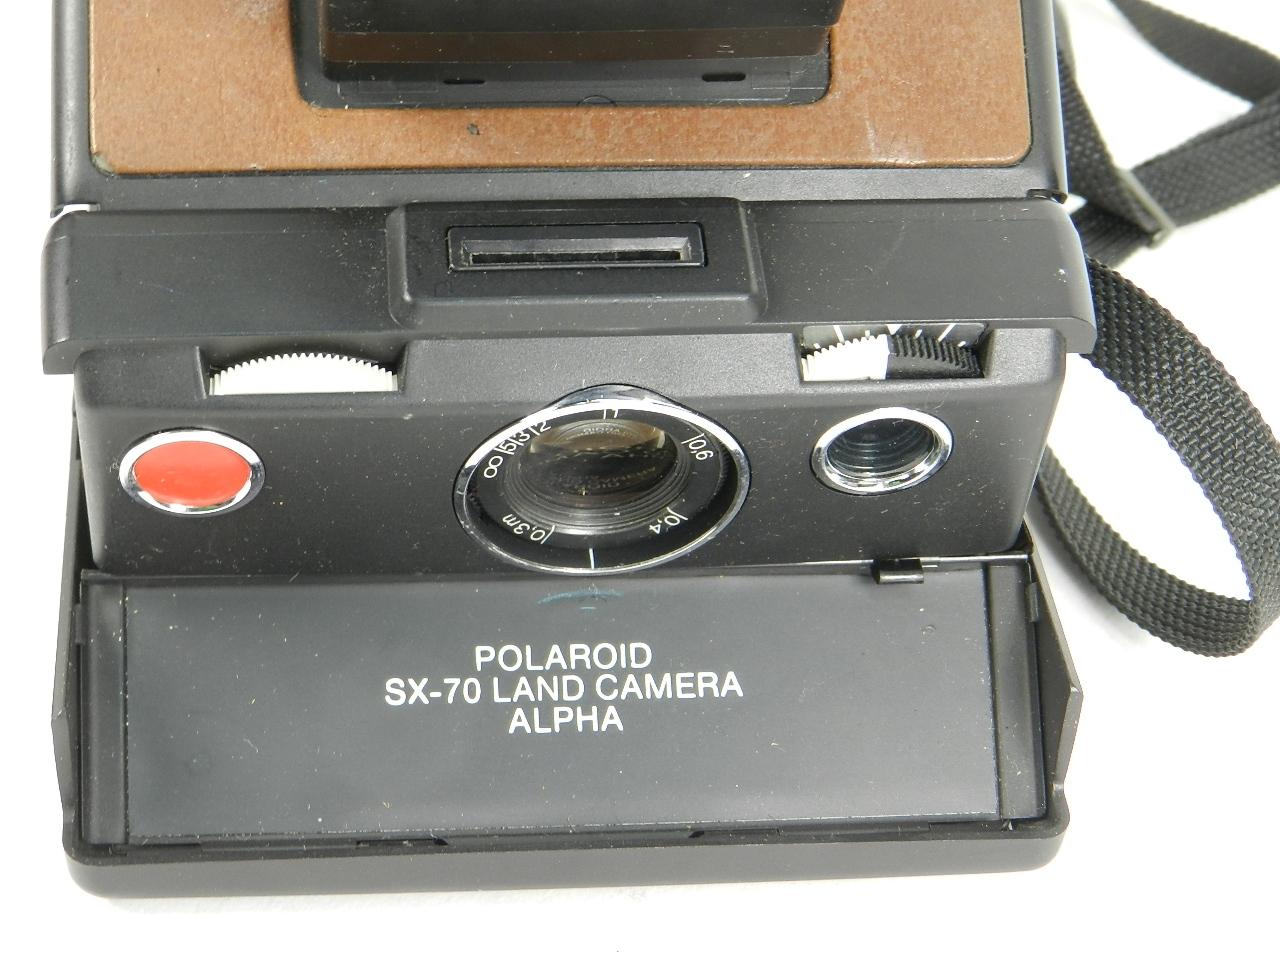 Imagen POLAROID SX-70 LAND CAMERA ALPHA 27774